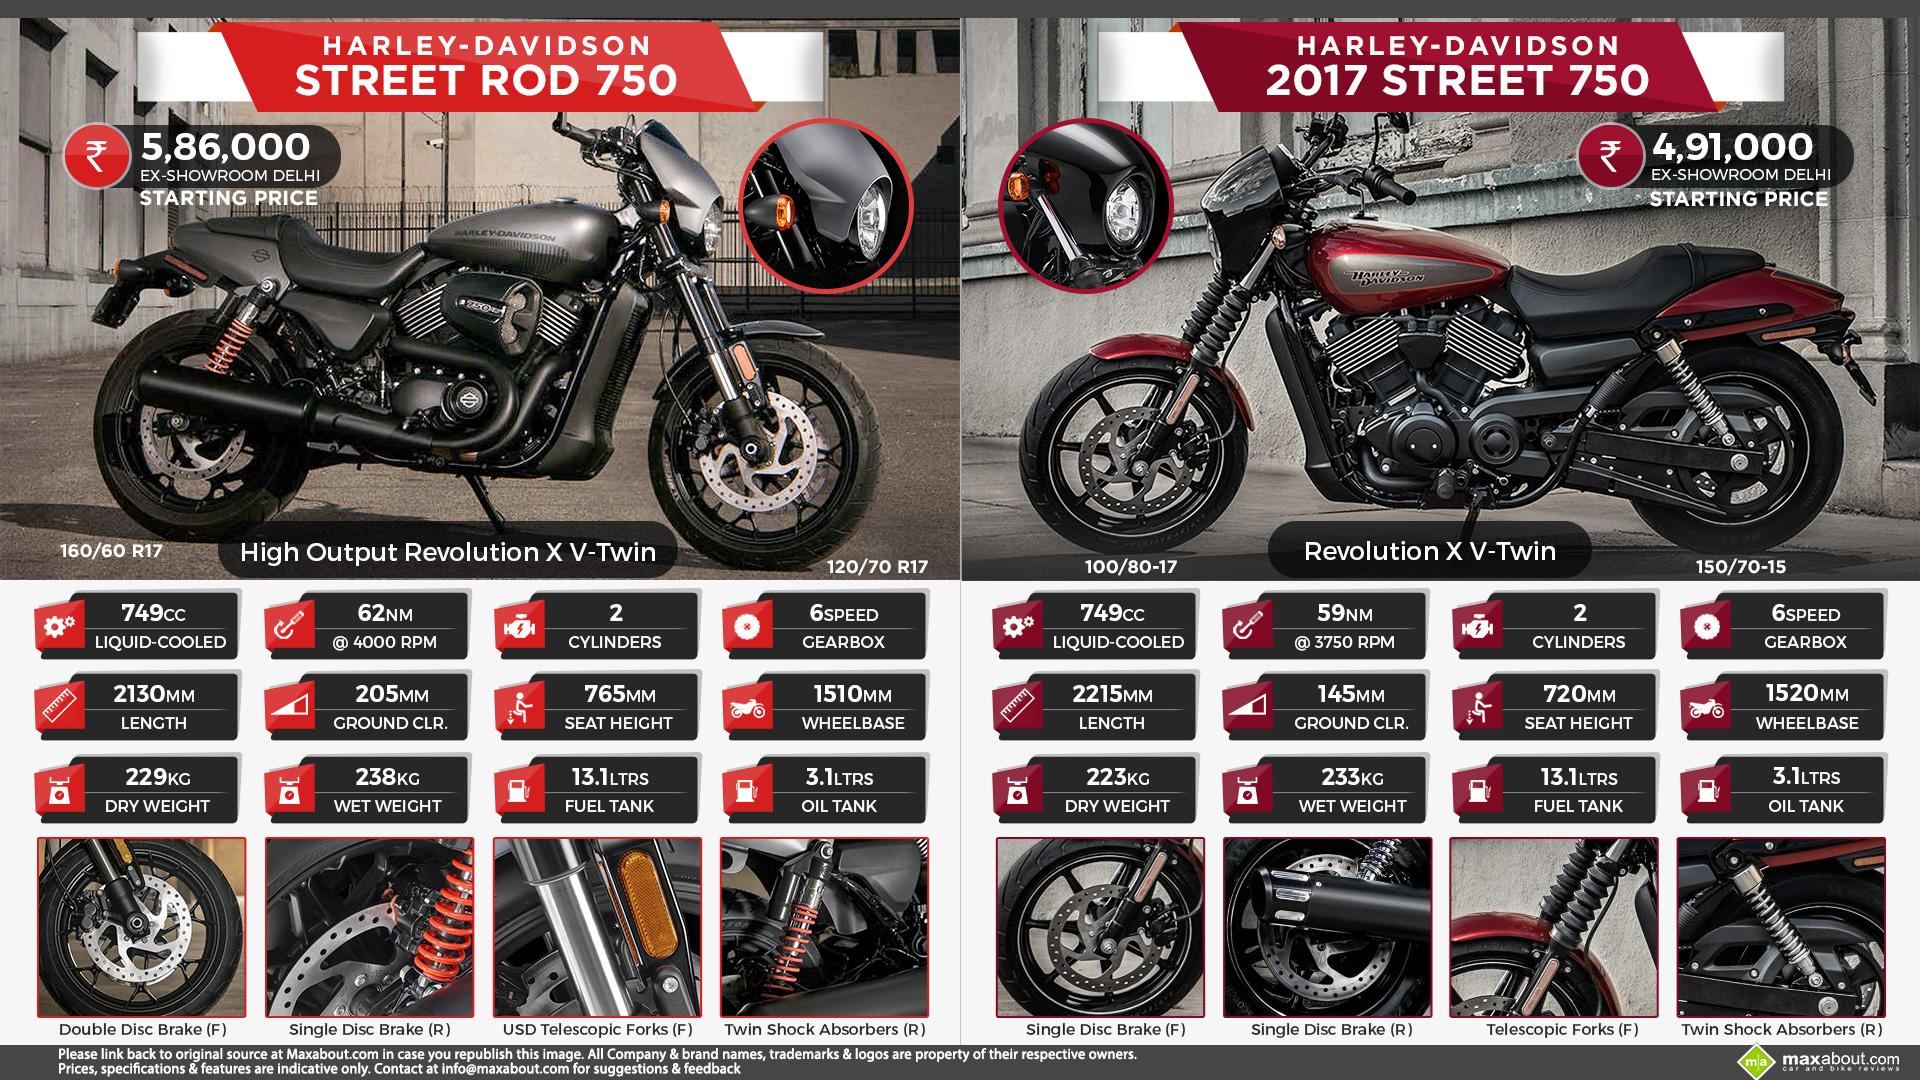 1340 Evo Engine Diagram - Wiring Diagram Database Harley Evolution Engine Diagram on